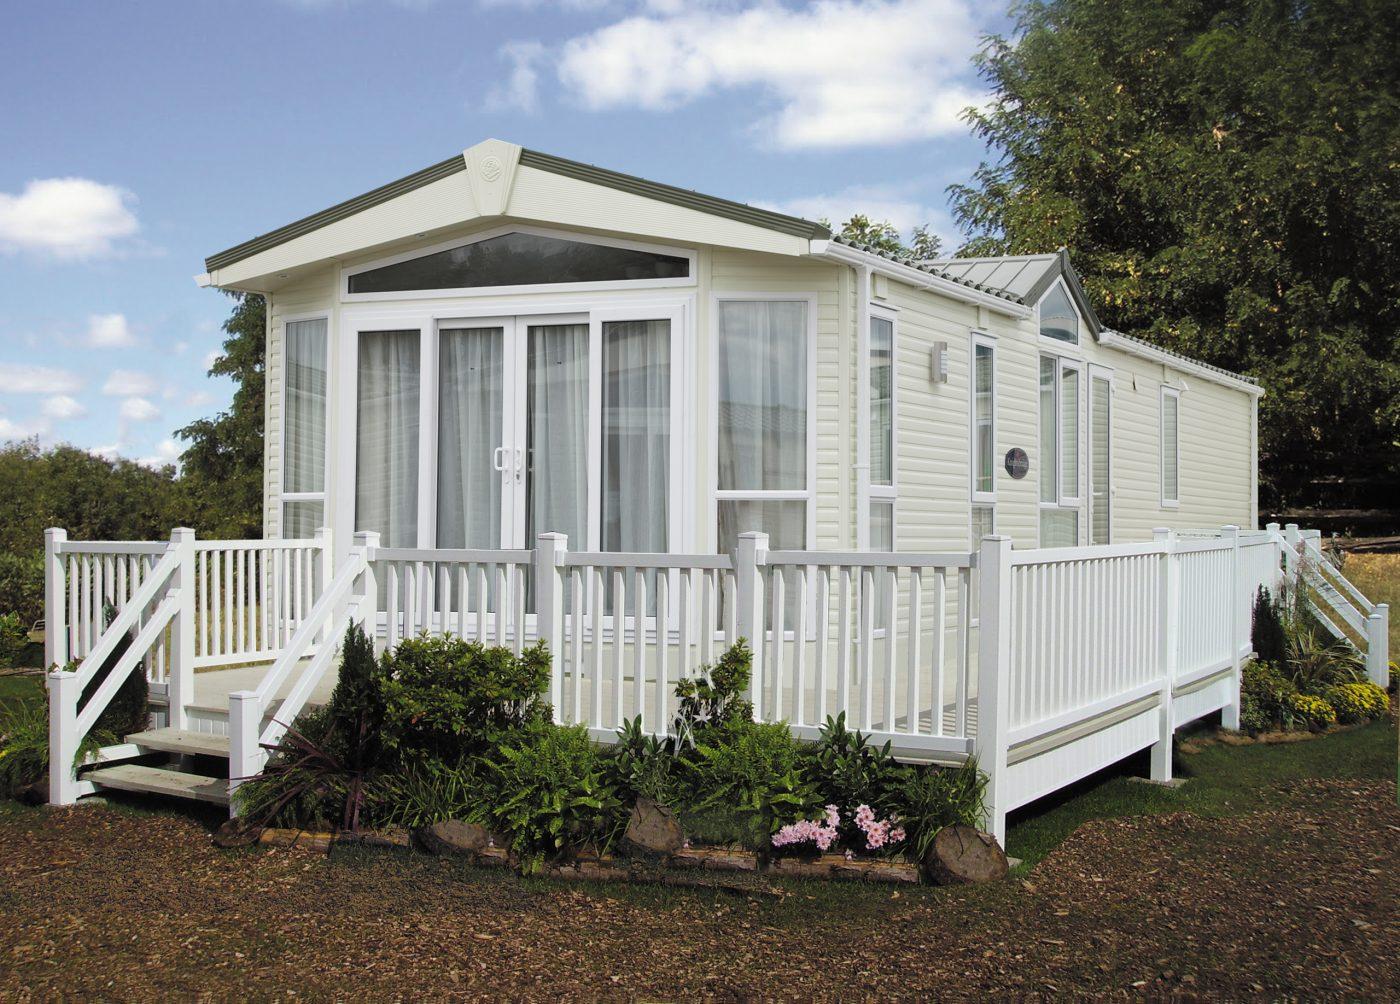 Pemberton knightsbridge 2015 mobile home smyth leisure for Pemberton cabins